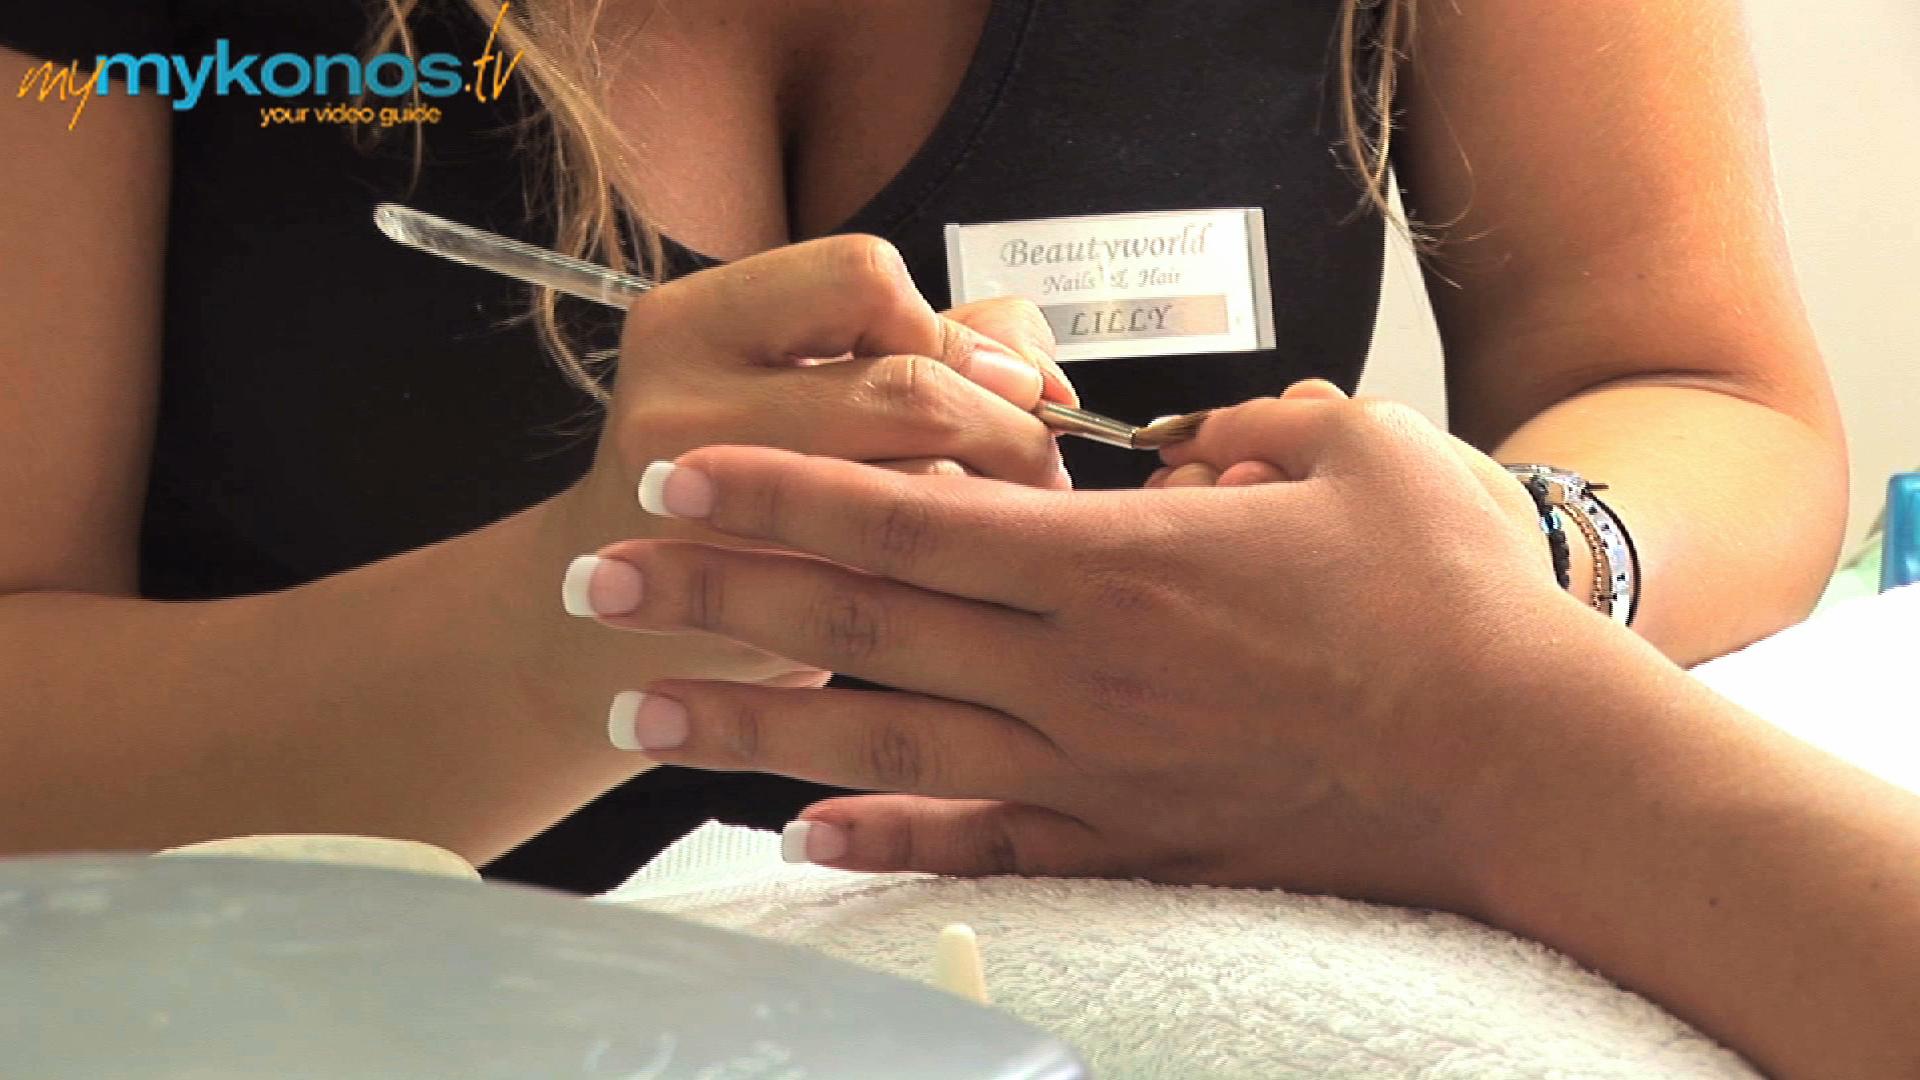 Hair & Nails in Mykonos